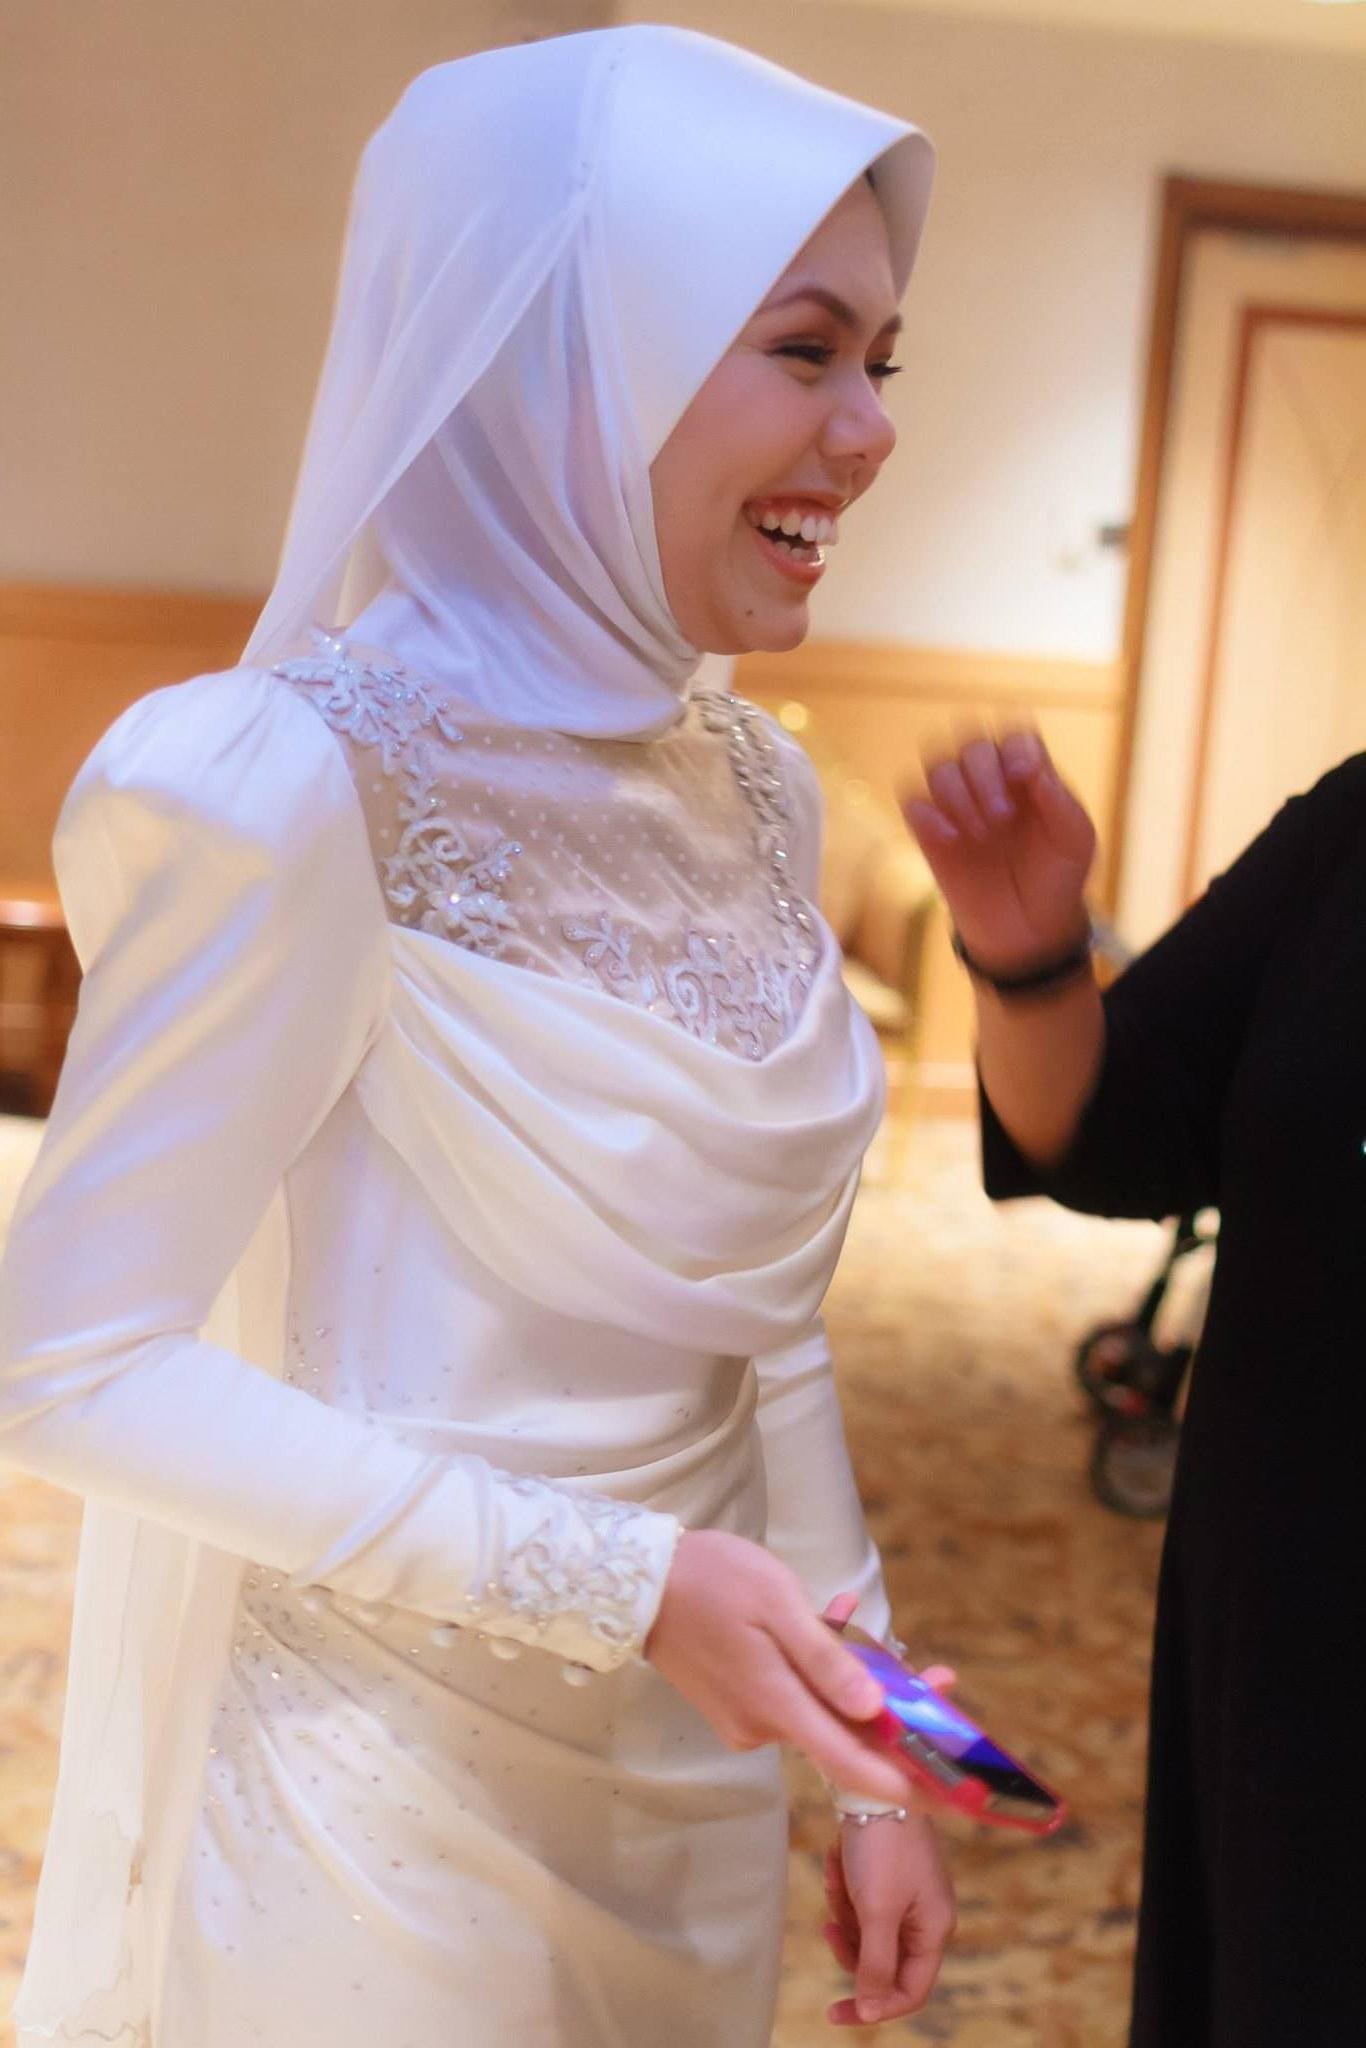 Inspirasi Foto Baju Pengantin Muslim Irdz Baju Pengantin Moden Baju Pengantin songket by Melinda